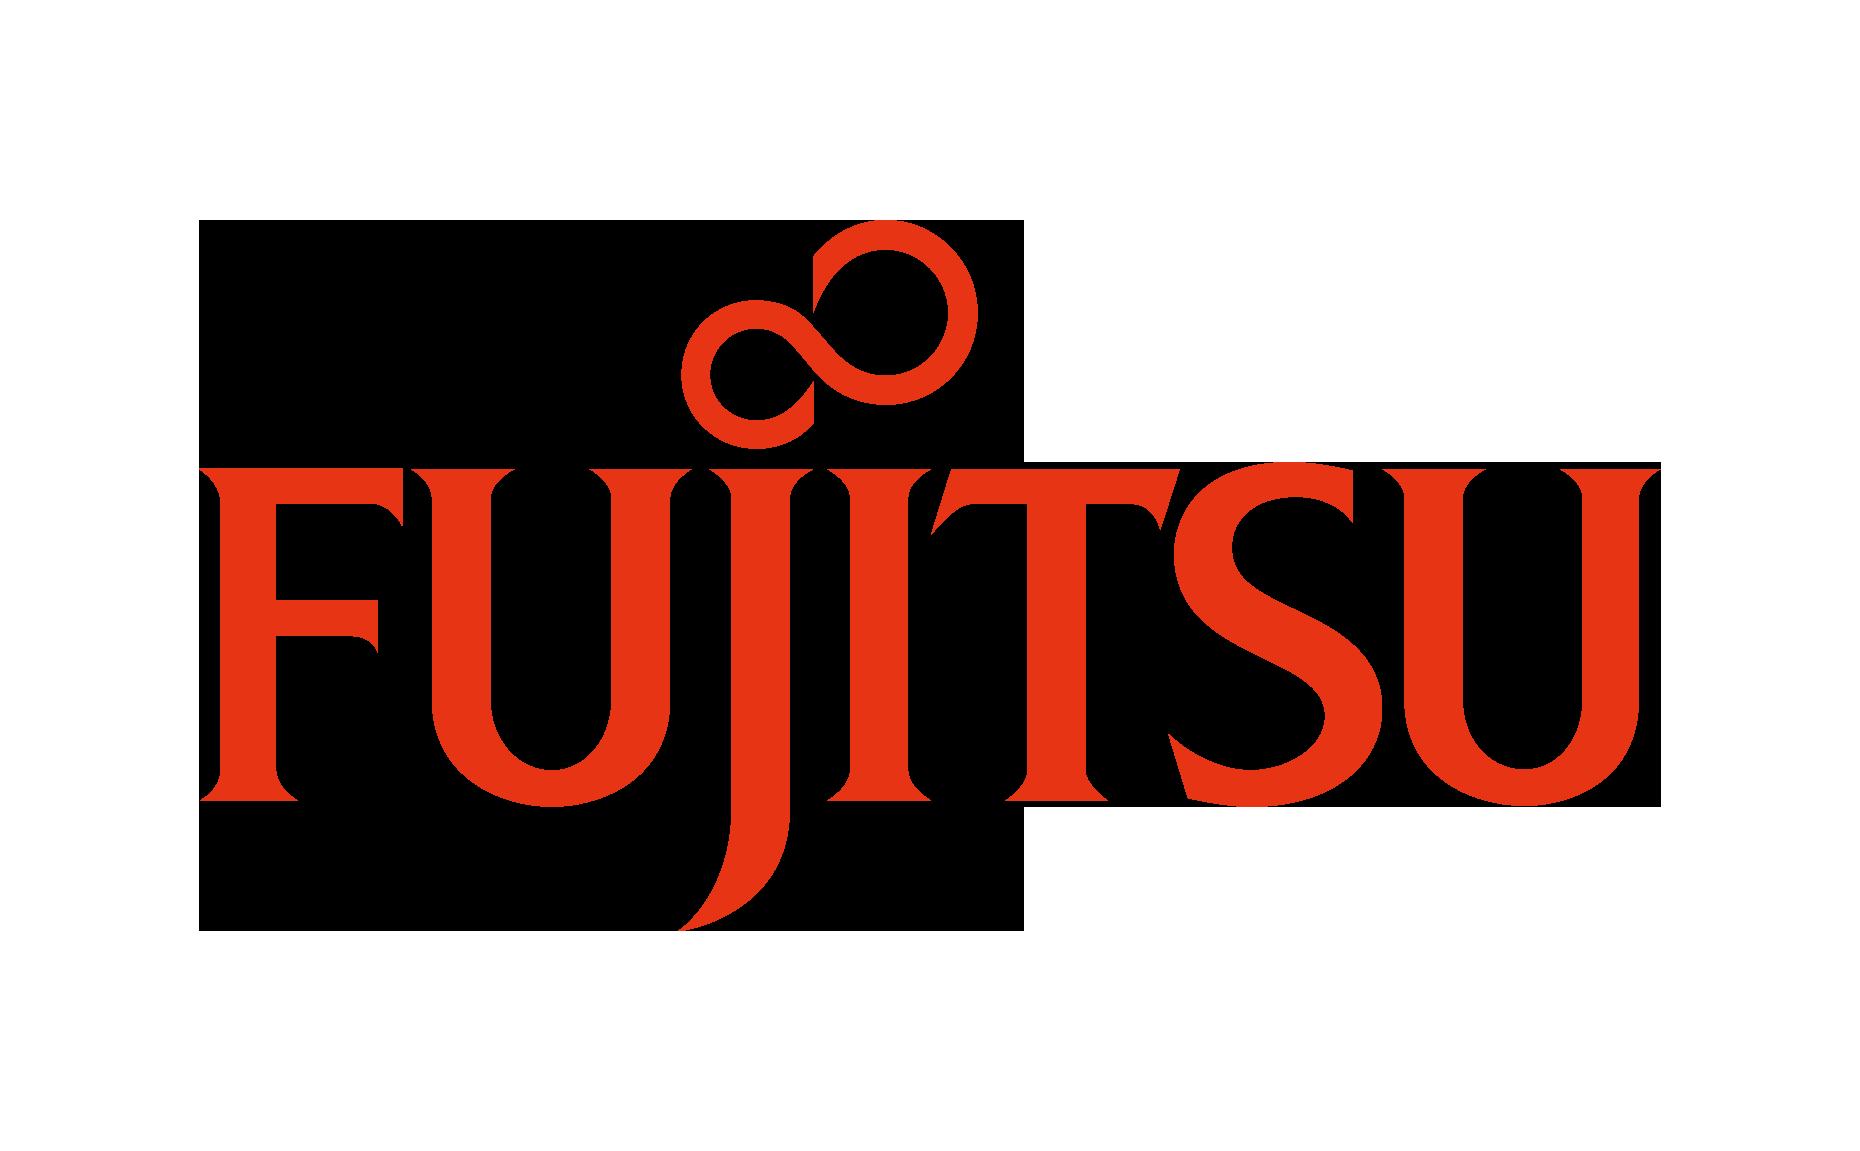 fujitsu vendors